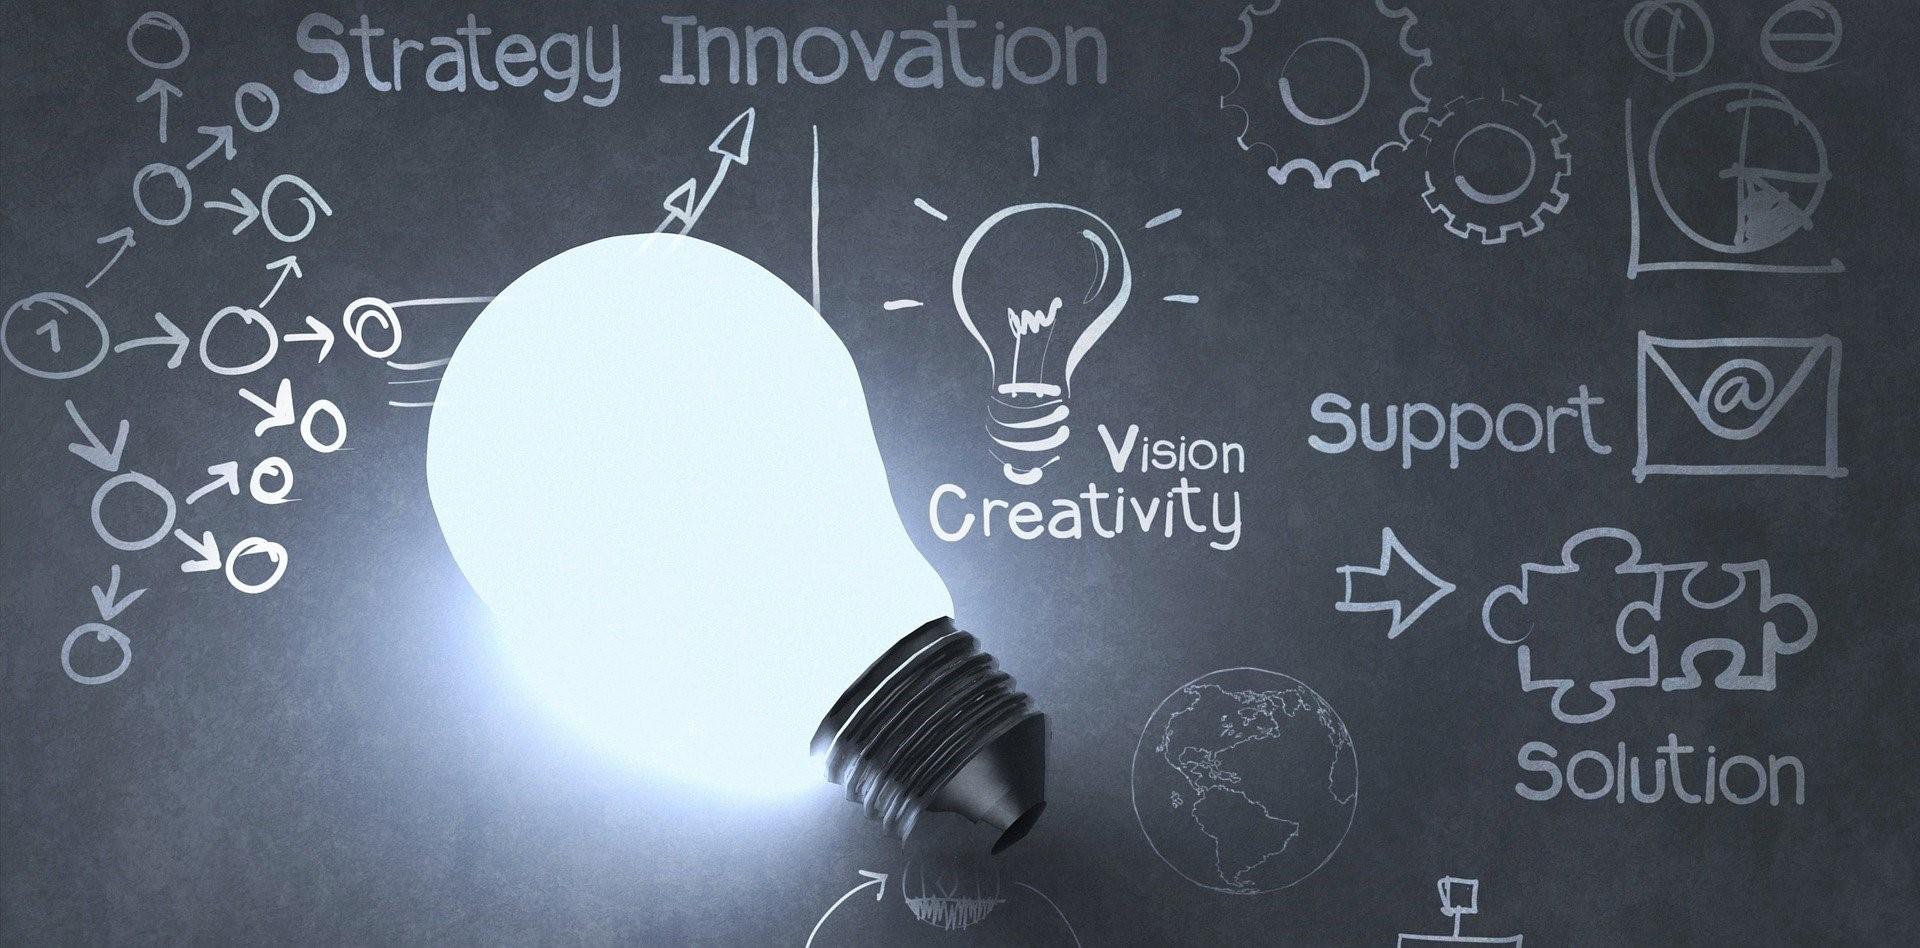 Light bulb on a chalkboard background highlighting innovation